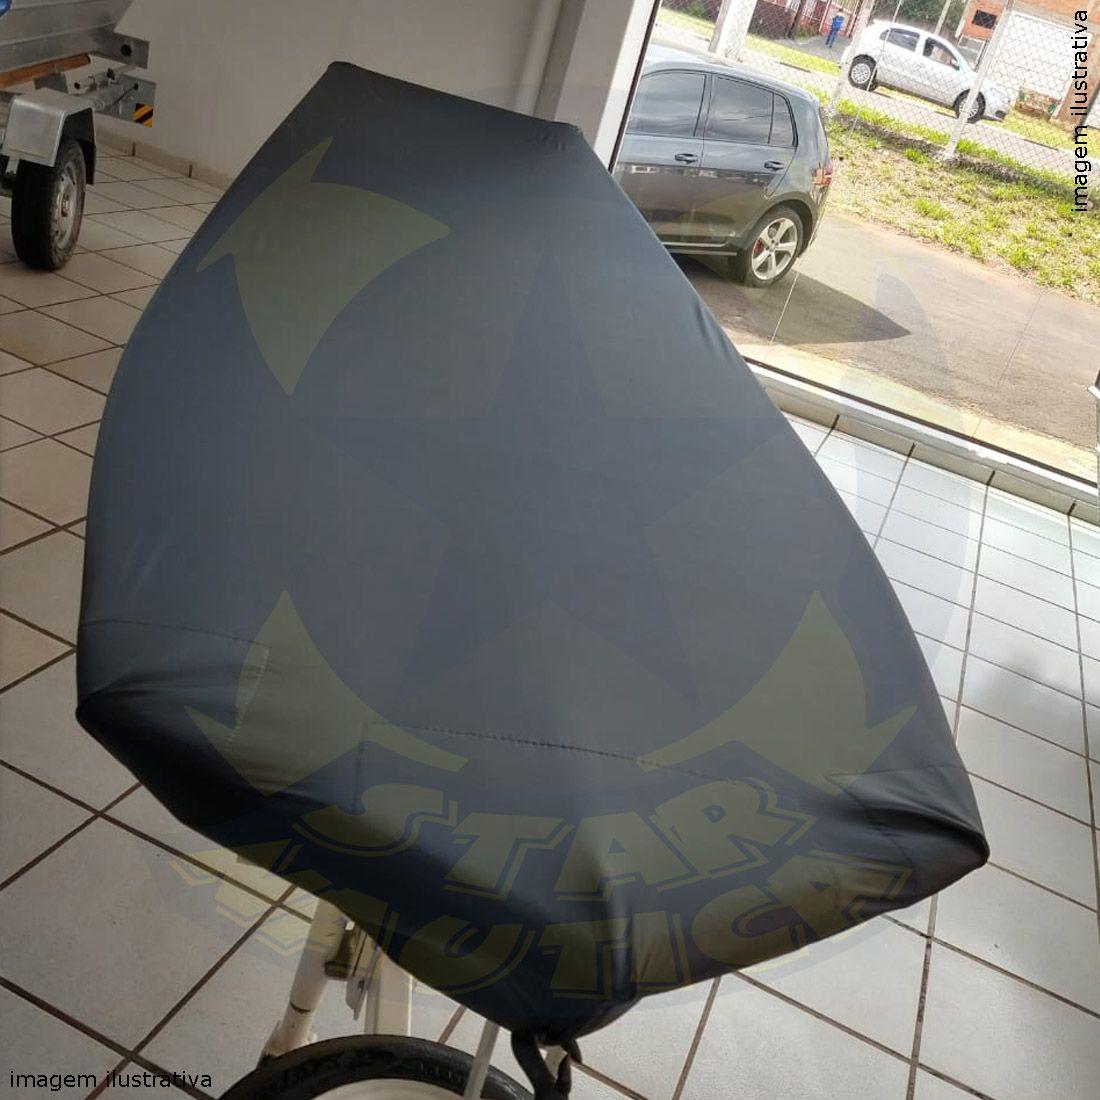 Capa Lona de Cobertura Barco Calaça Flash Bass 500 Lona Poliéster